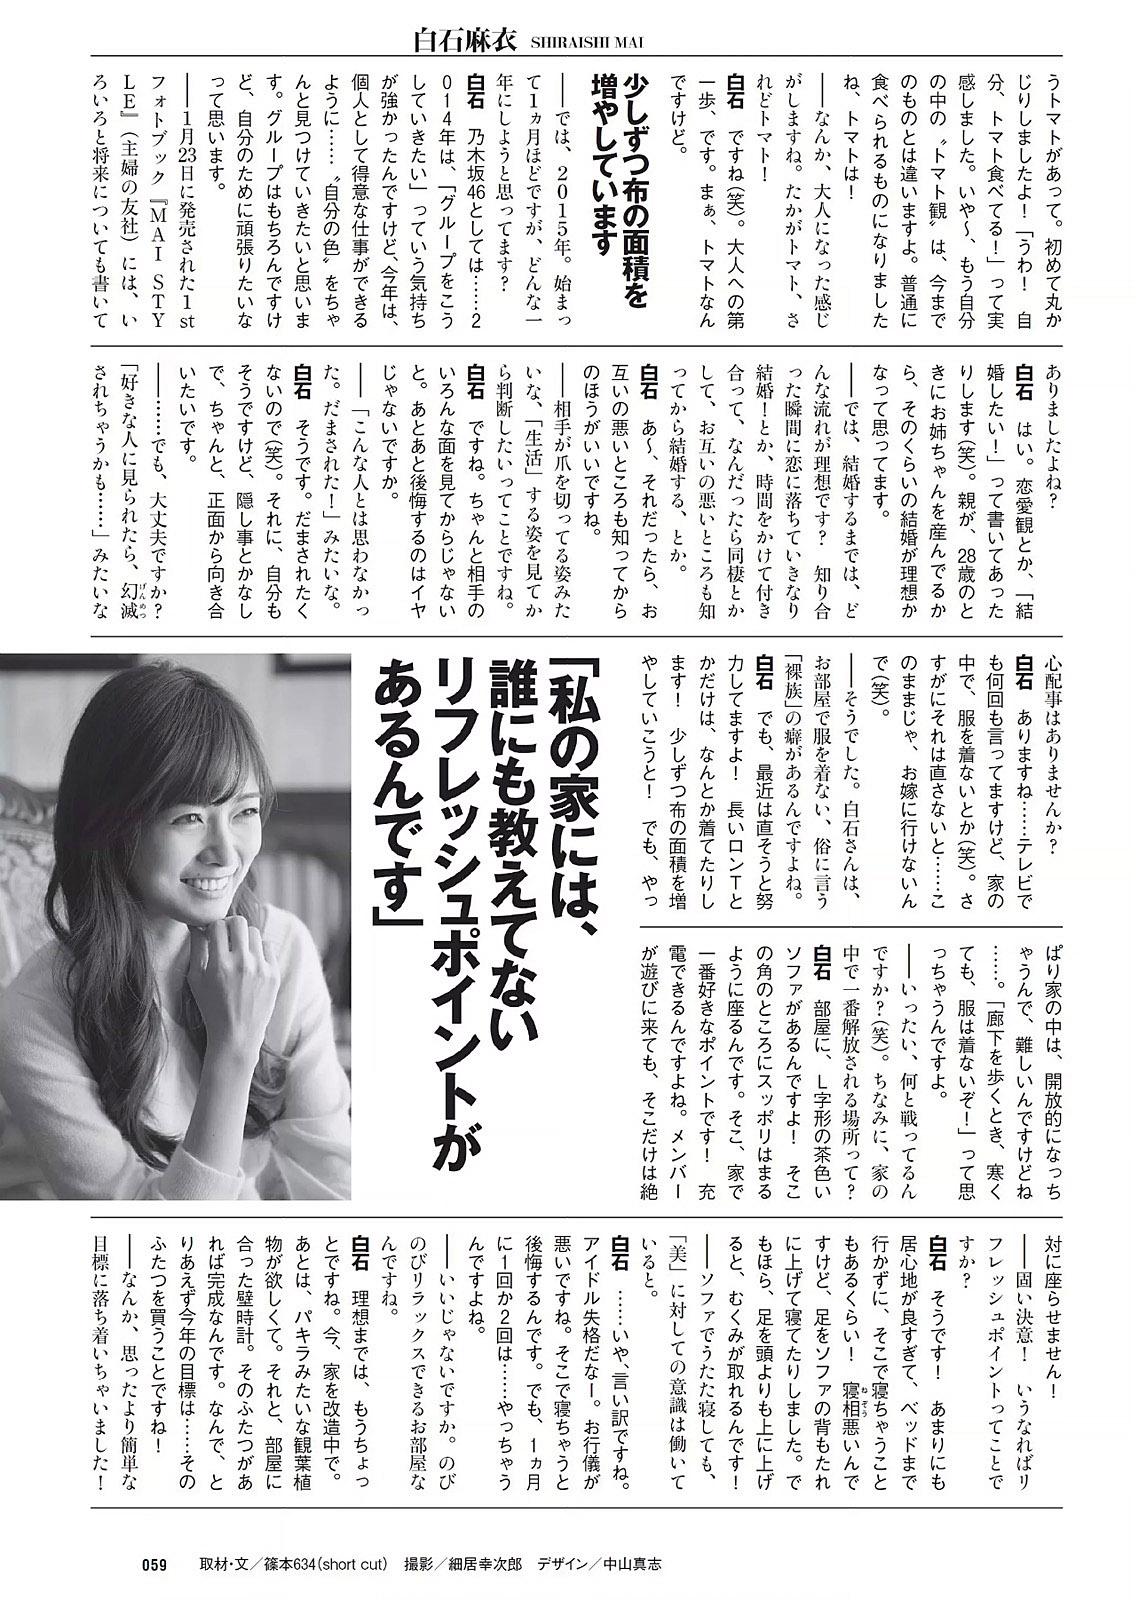 MShiraishi WPB 150223 11.jpg